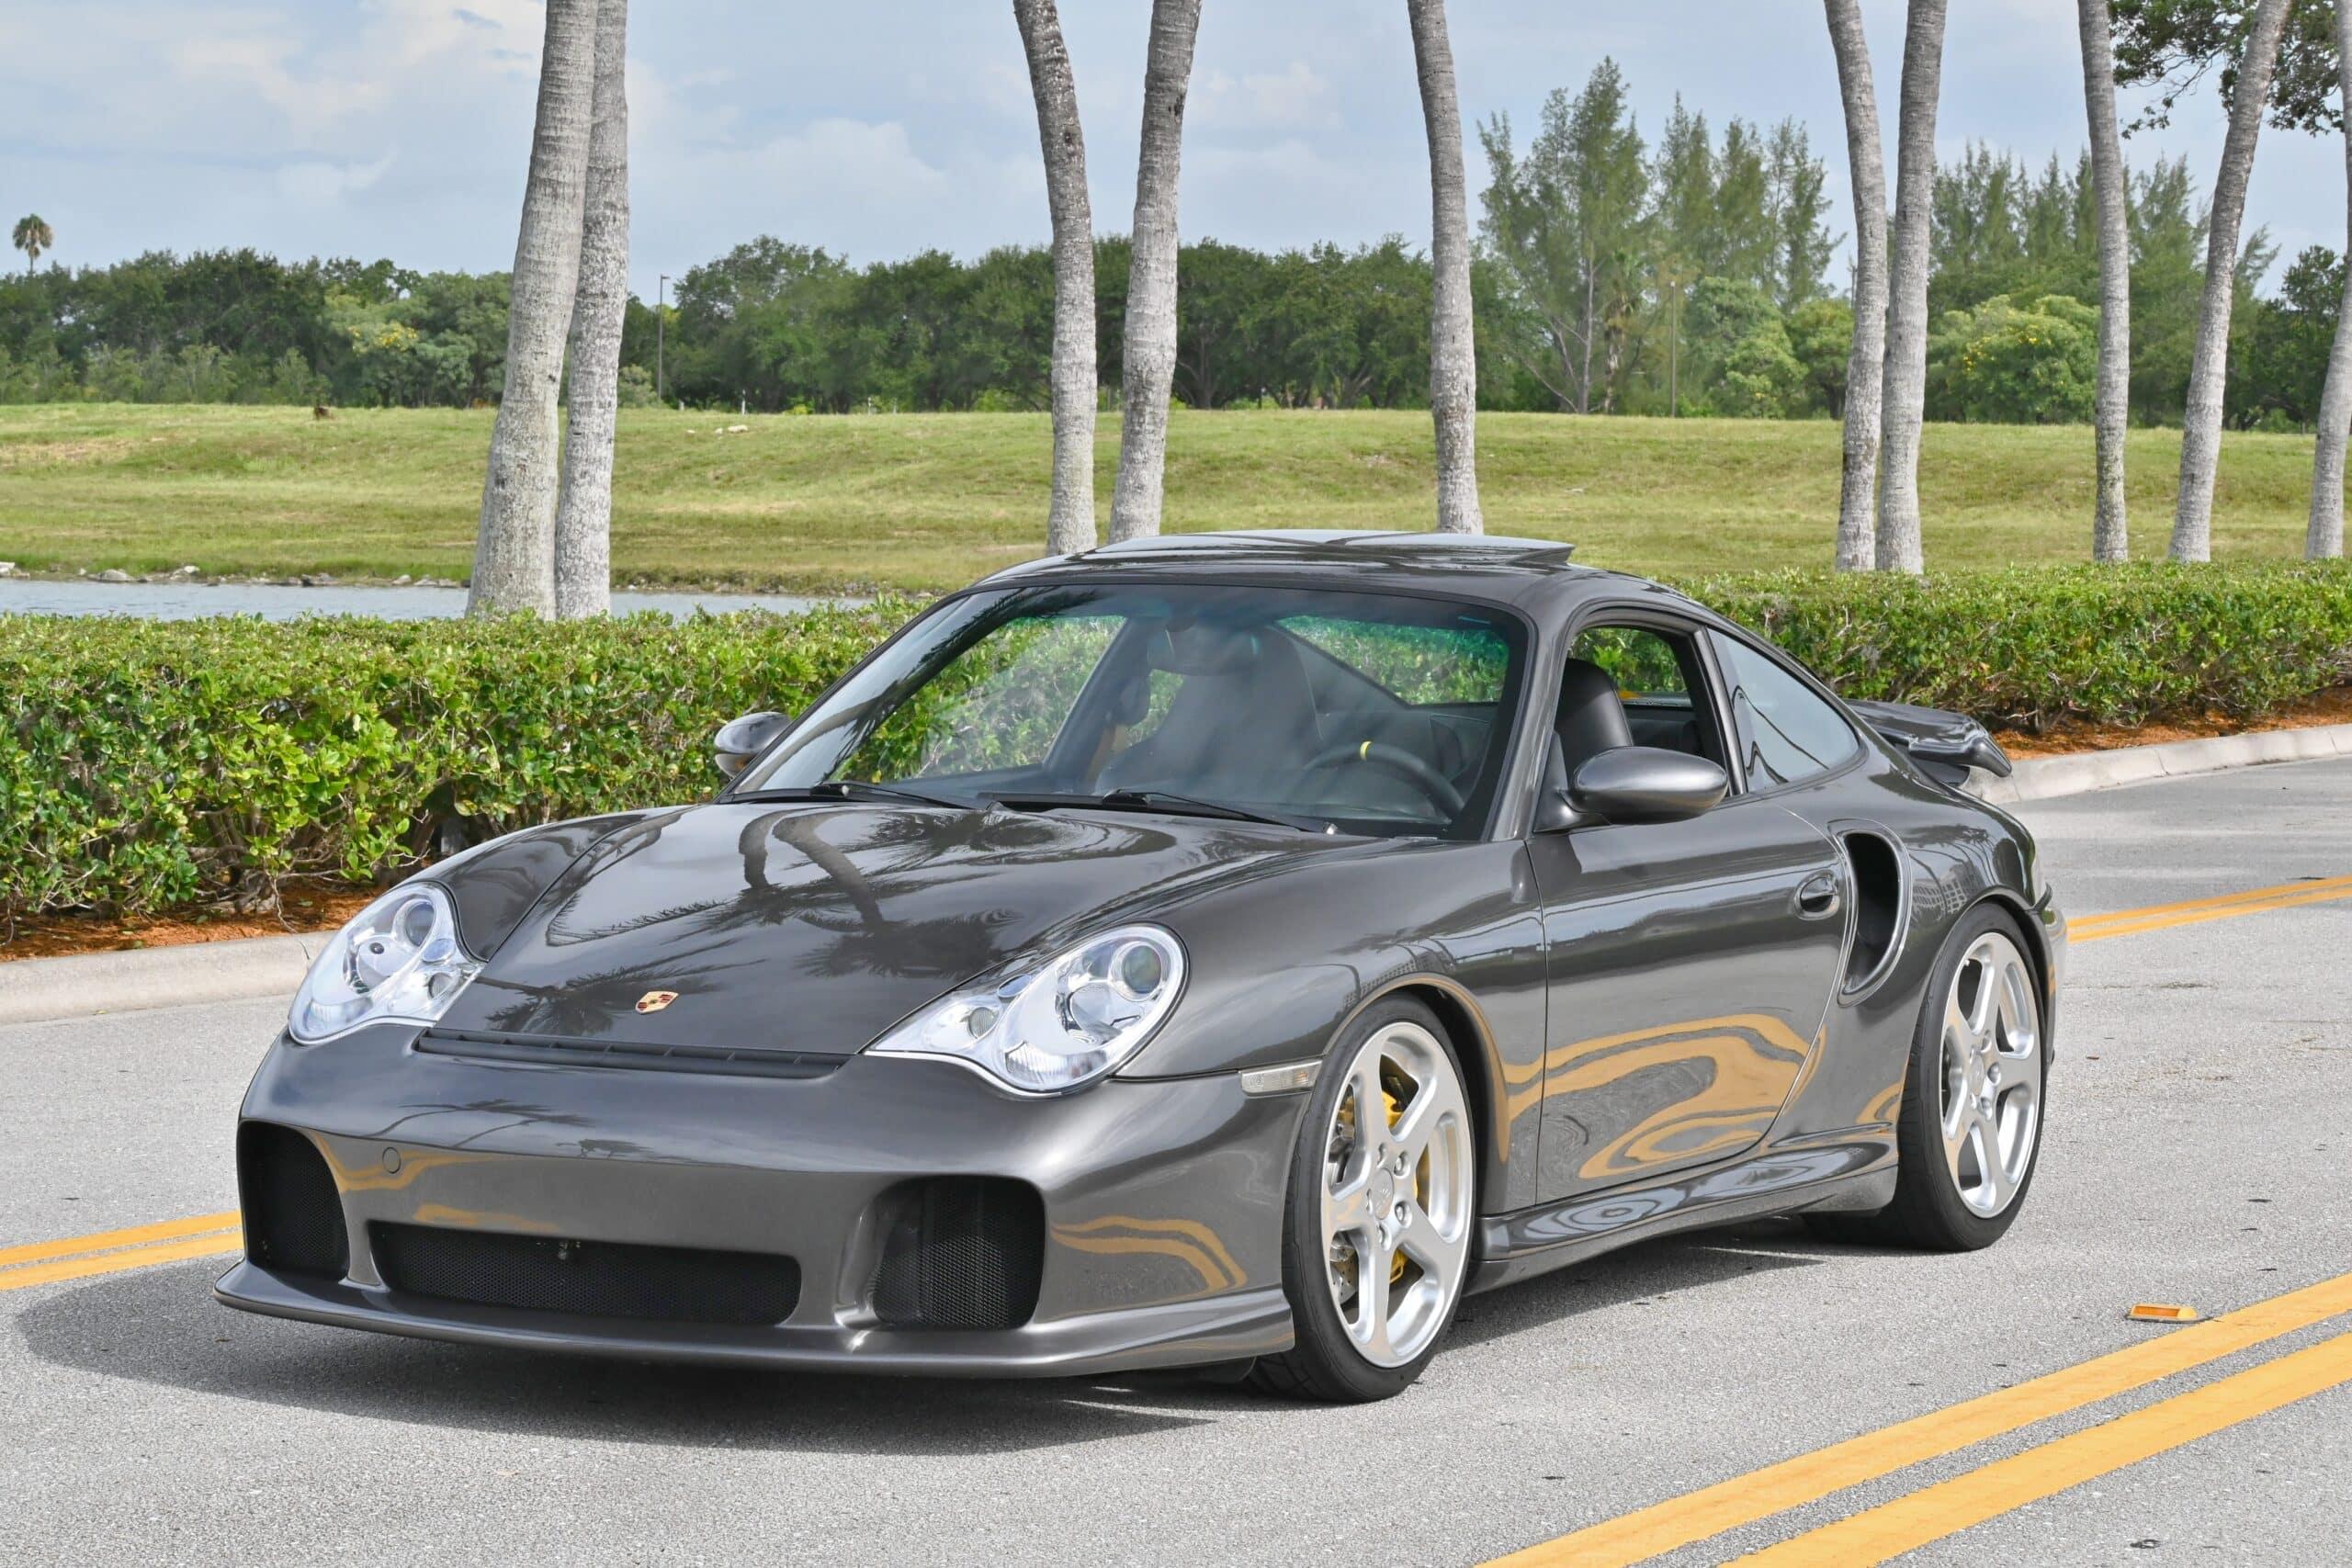 2005 Porsche 911 Turbo S 996 Original Paint-Carbon Ceramic Brakes-Sport Seats- RUF Upgrades- RARE TURBO S